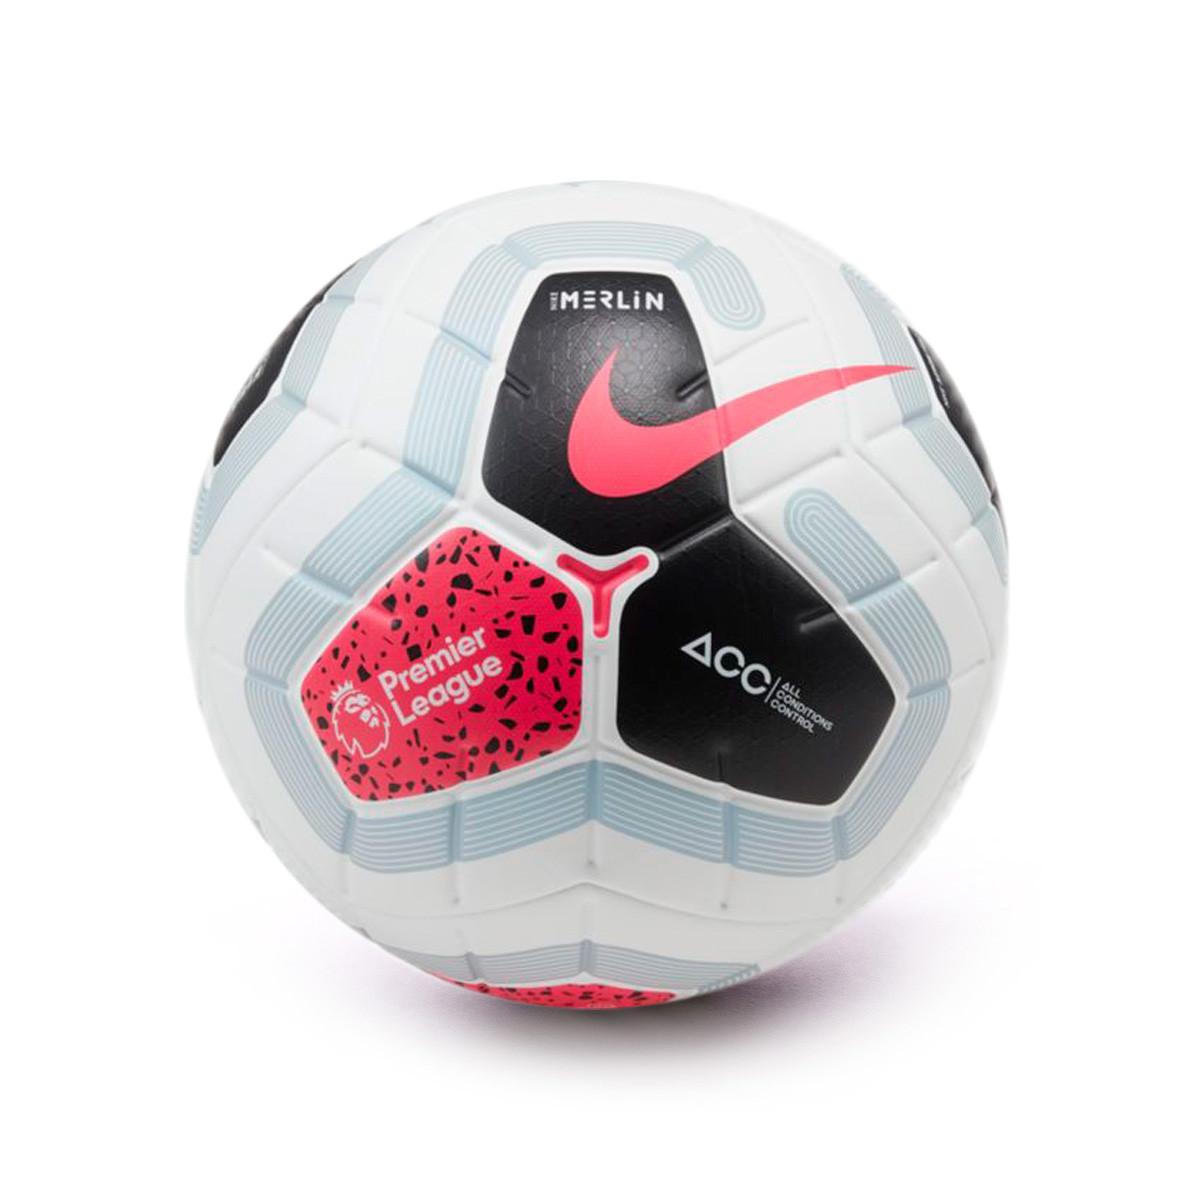 mariposa más como resultado  Ball Nike Premier League Merlin 2019-2020 White-Black-Cool grey-Racer pink  - Football store Fútbol Emotion